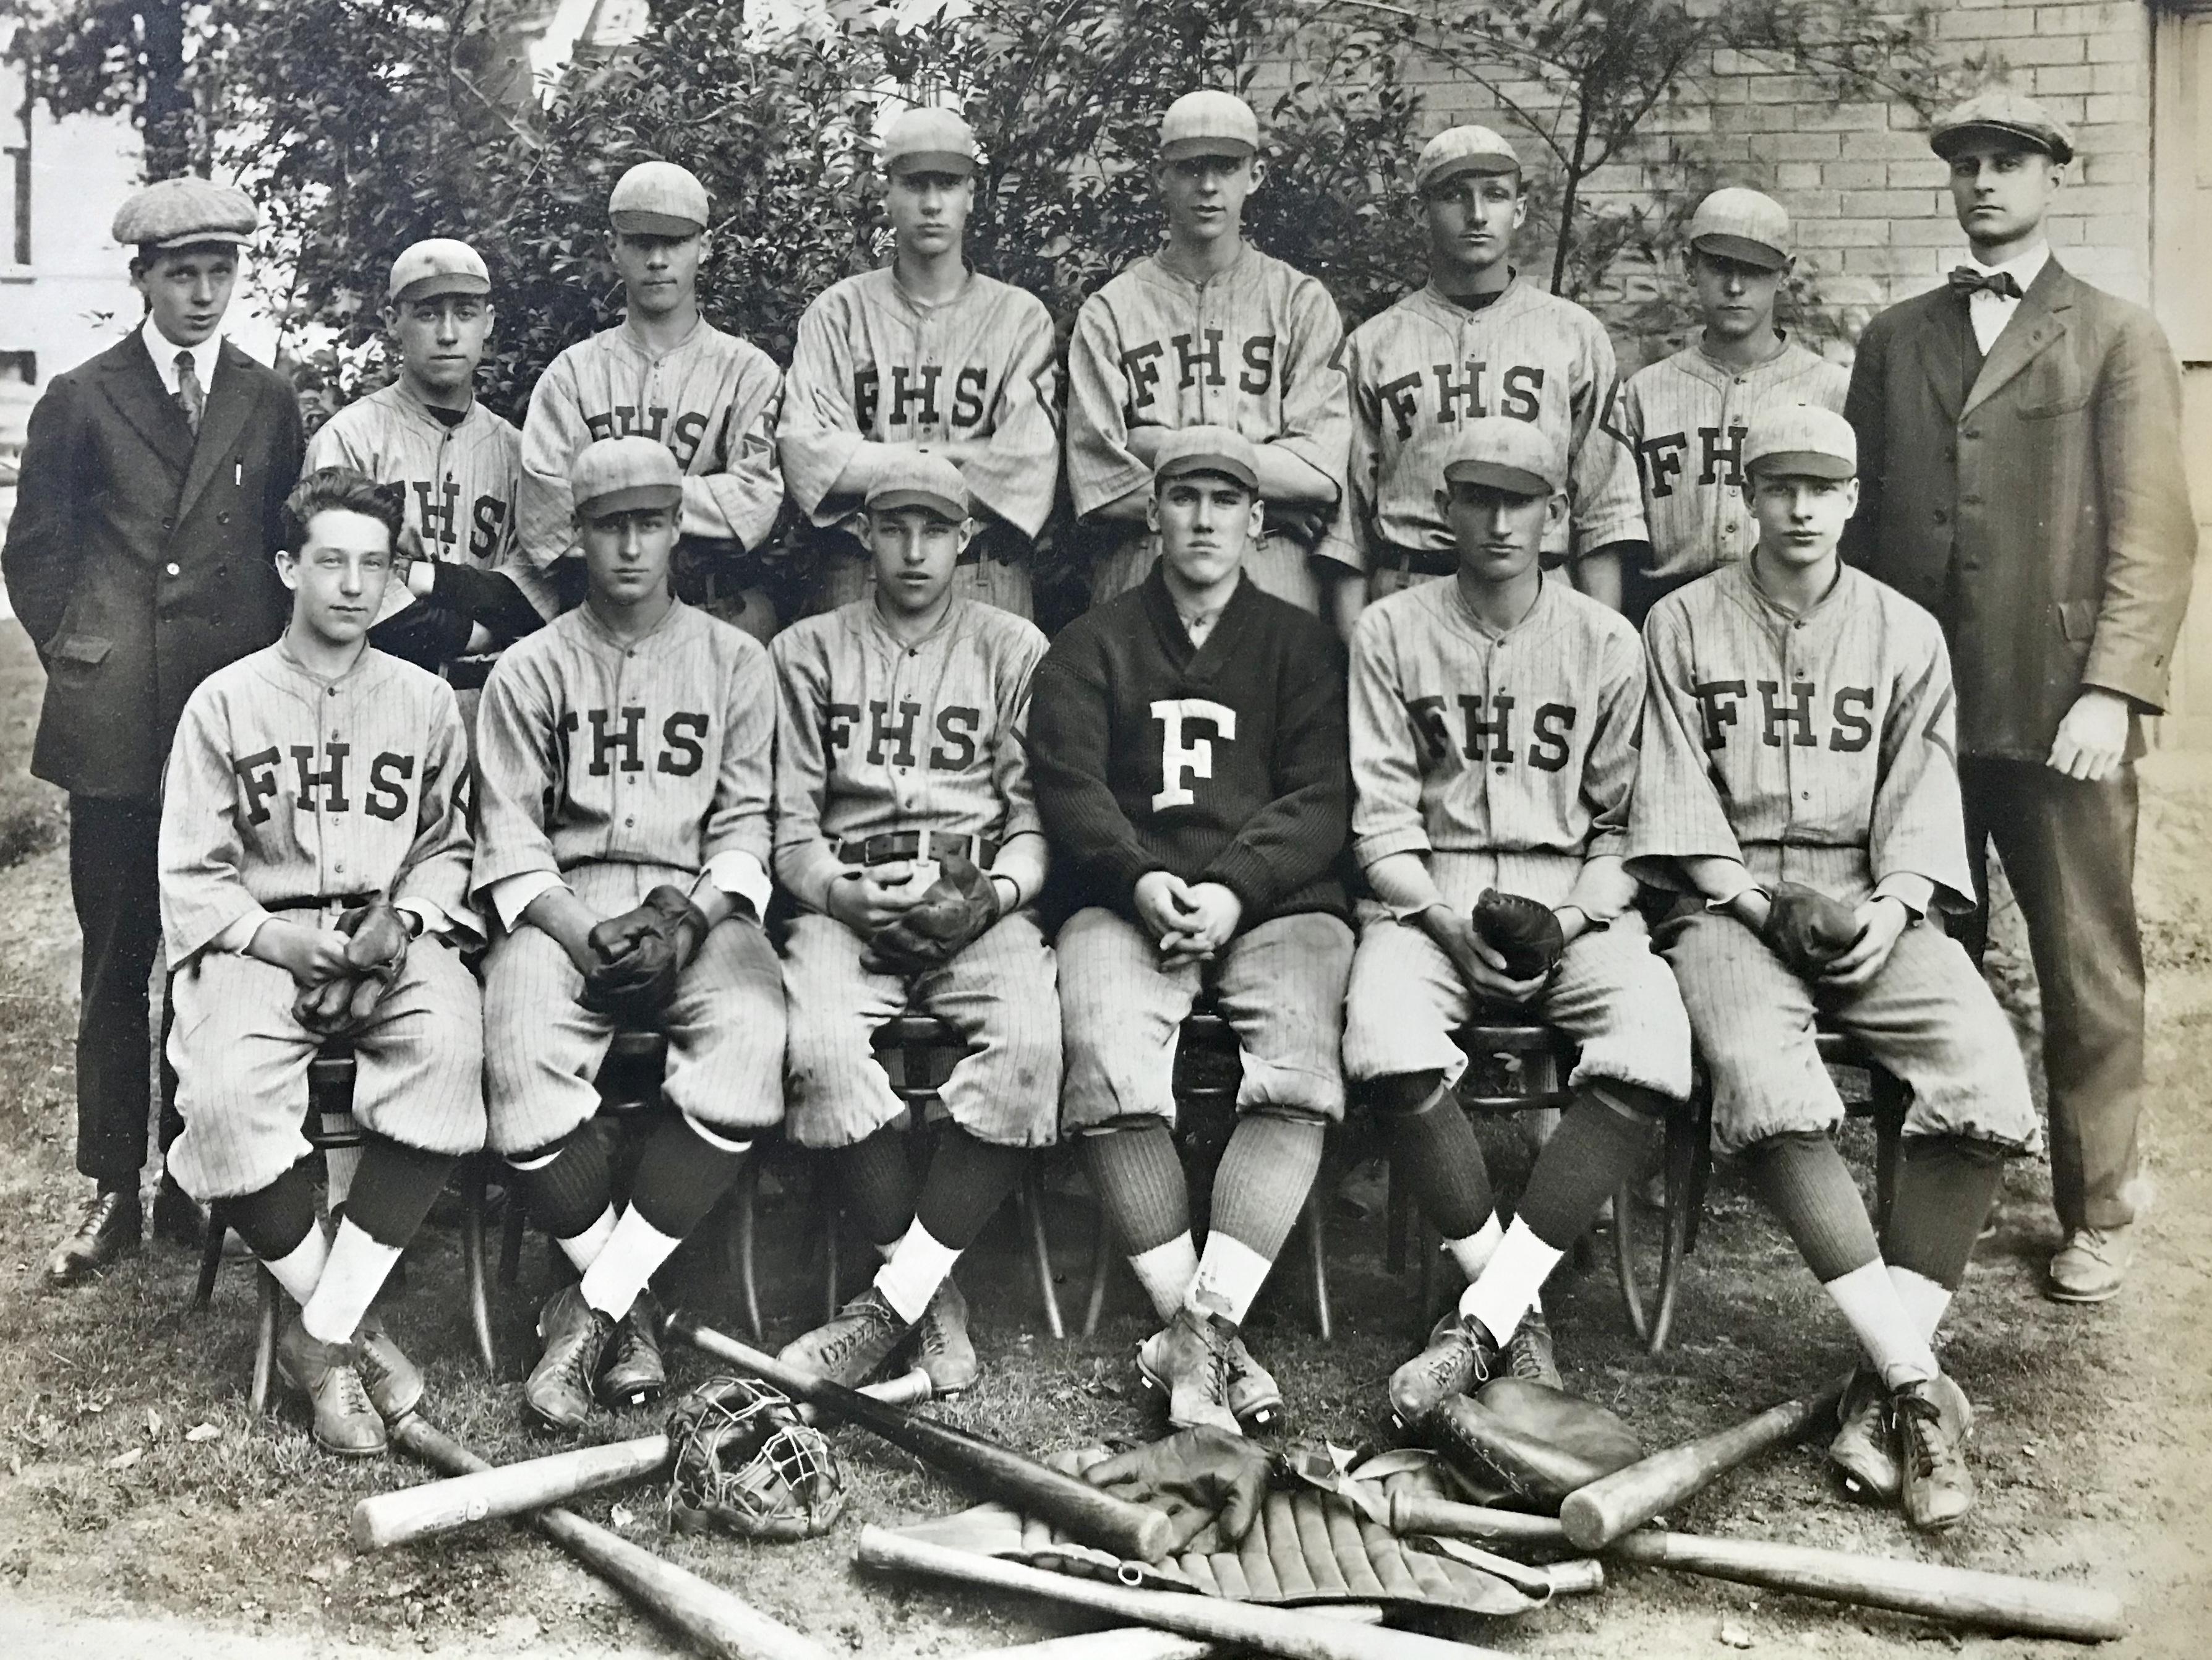 Photo of Framingham High School (Massachusetts) baseball team, circa 1919